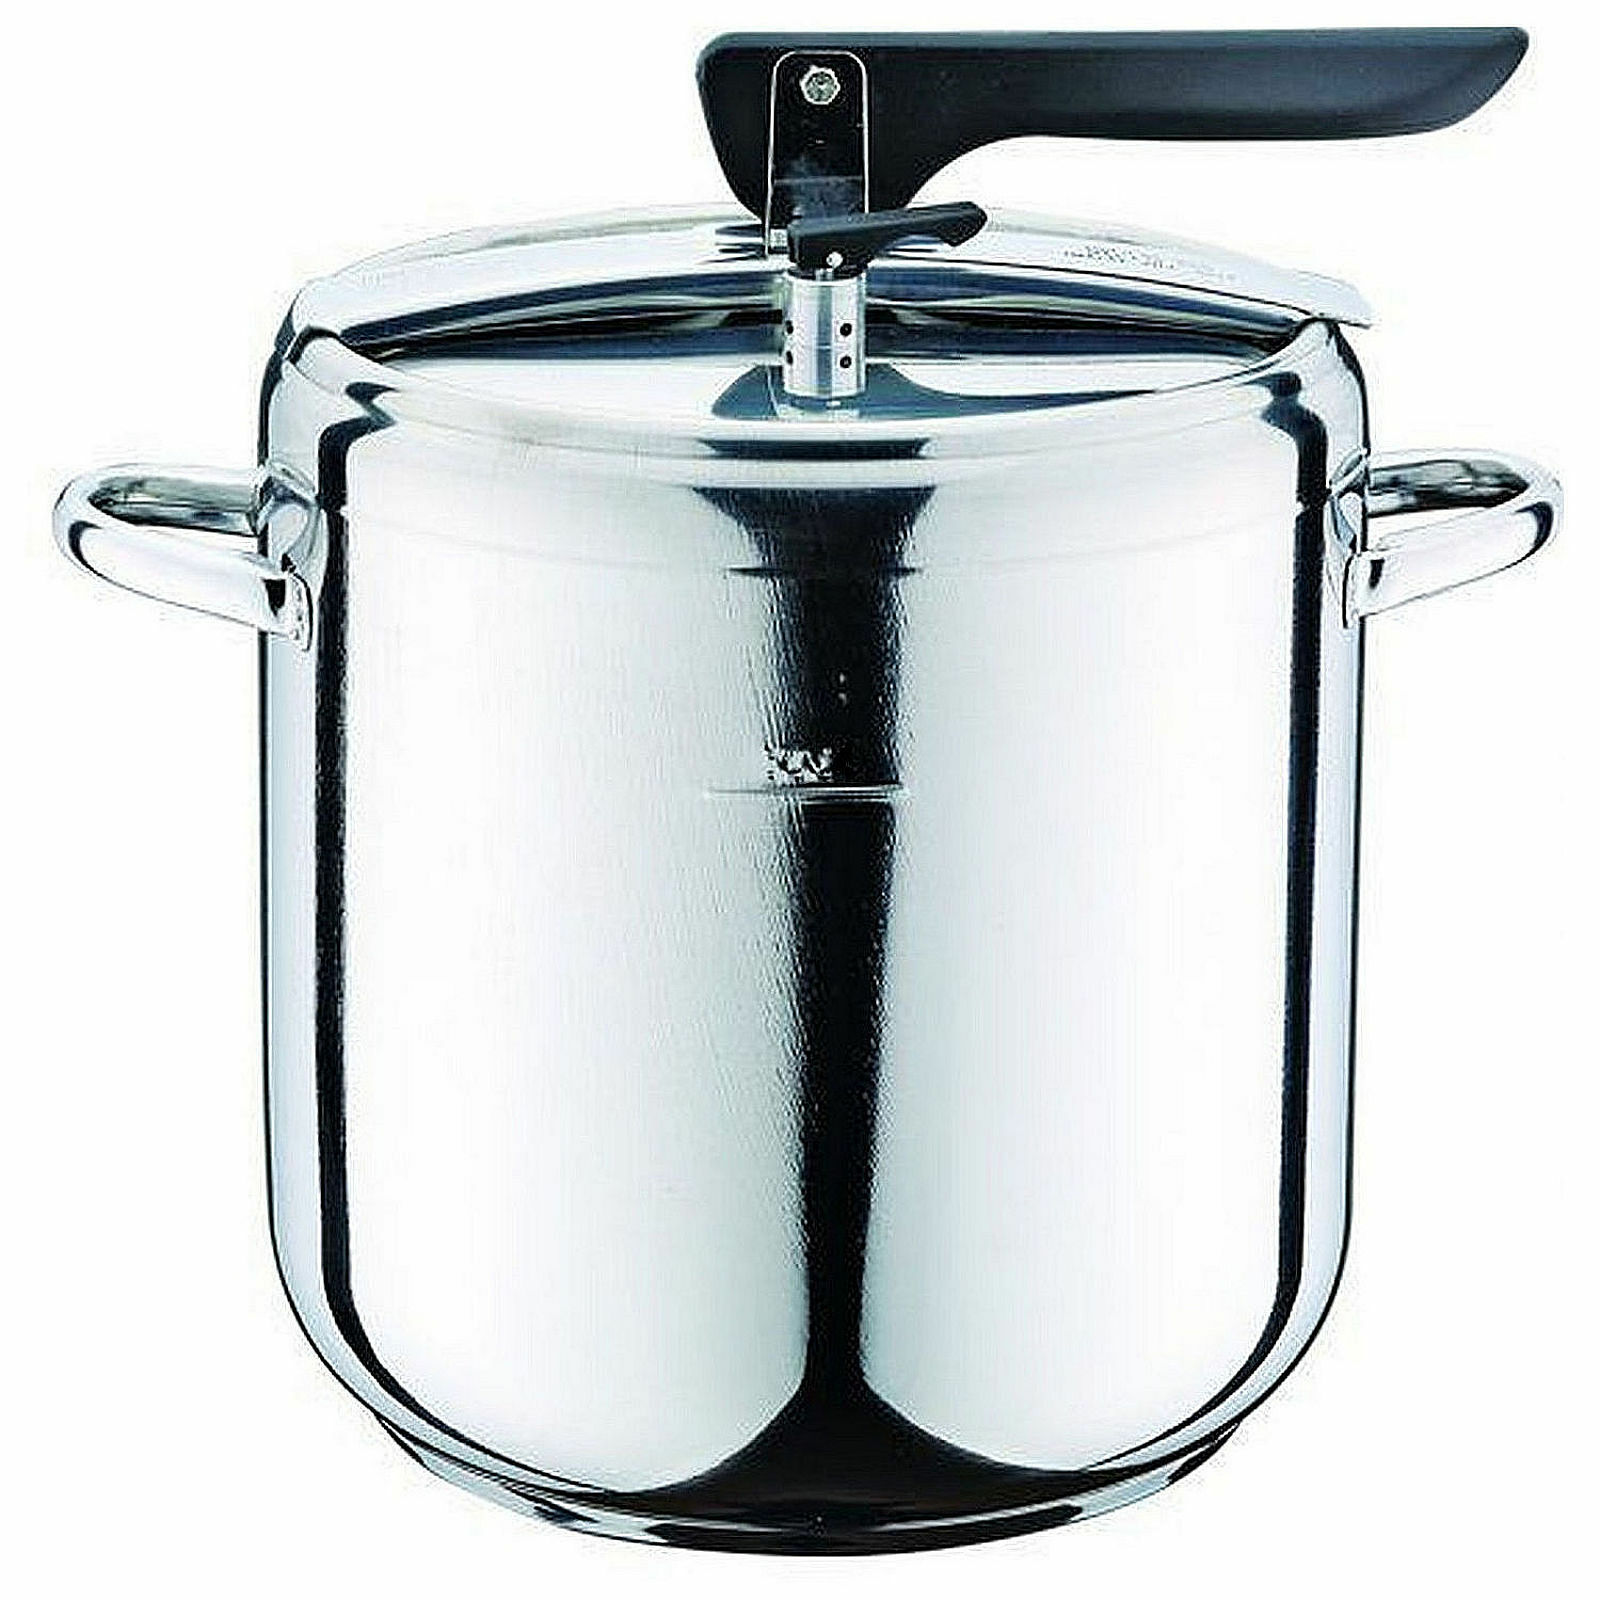 Snelkookpan  14 Liter Snelkookpannen 14L Pressure Cooker Trykkoger Tryckkokare